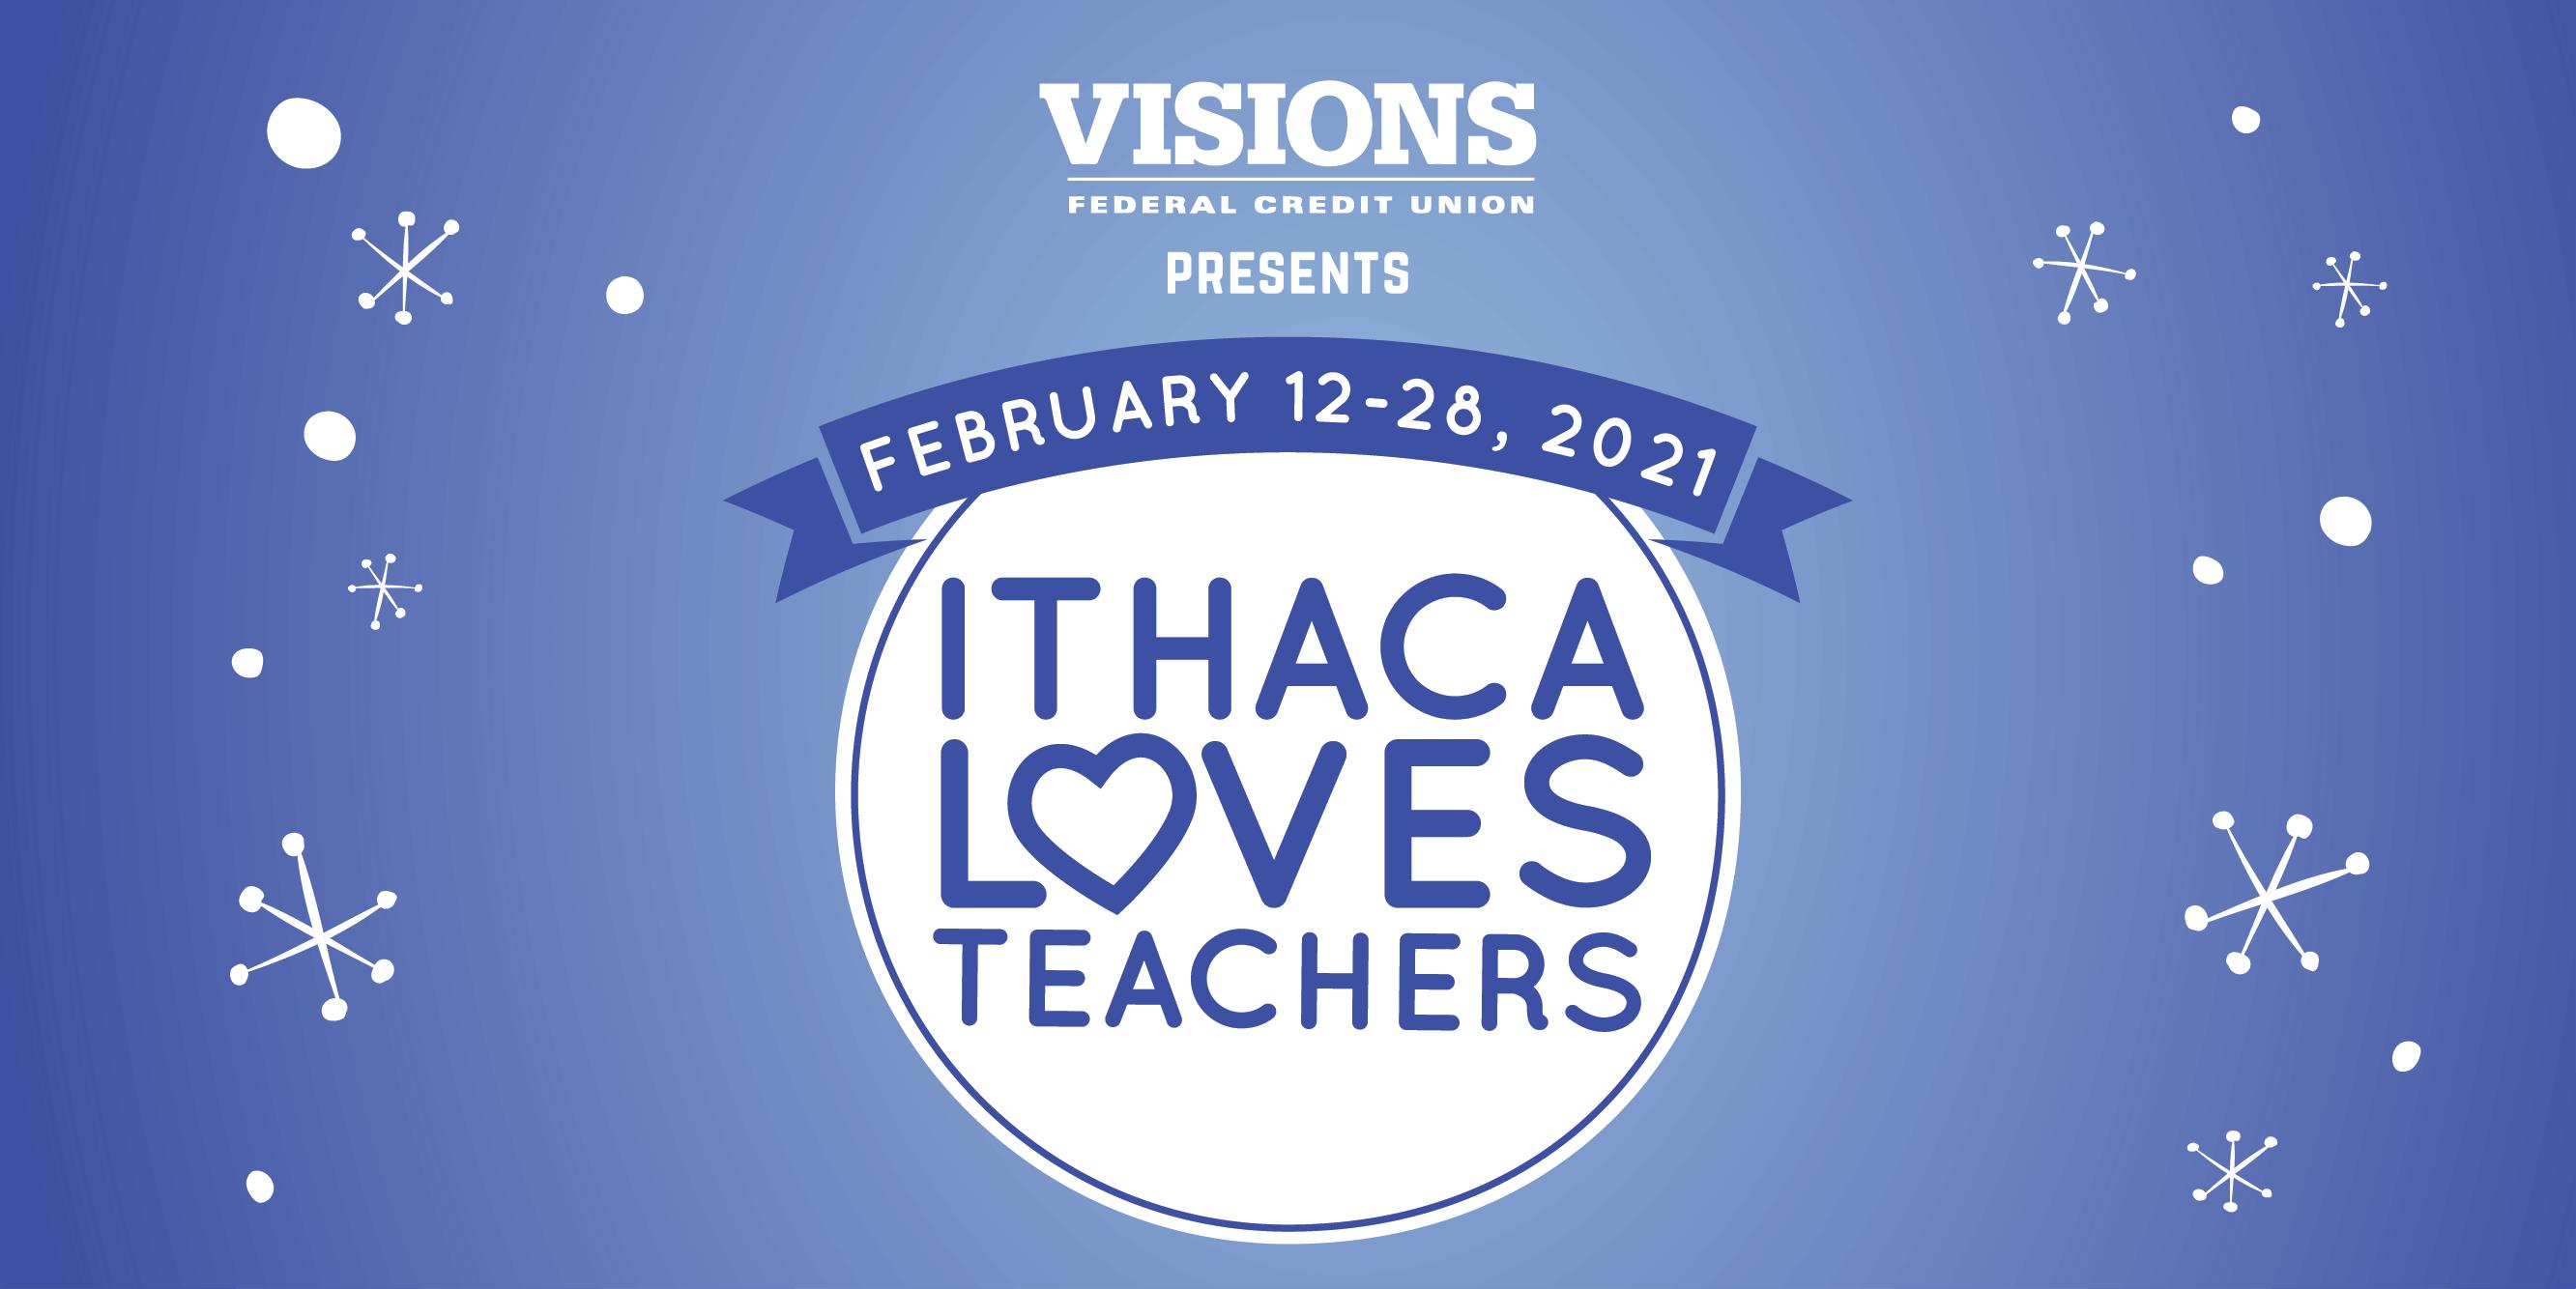 Ithaca Loves Teachers logo